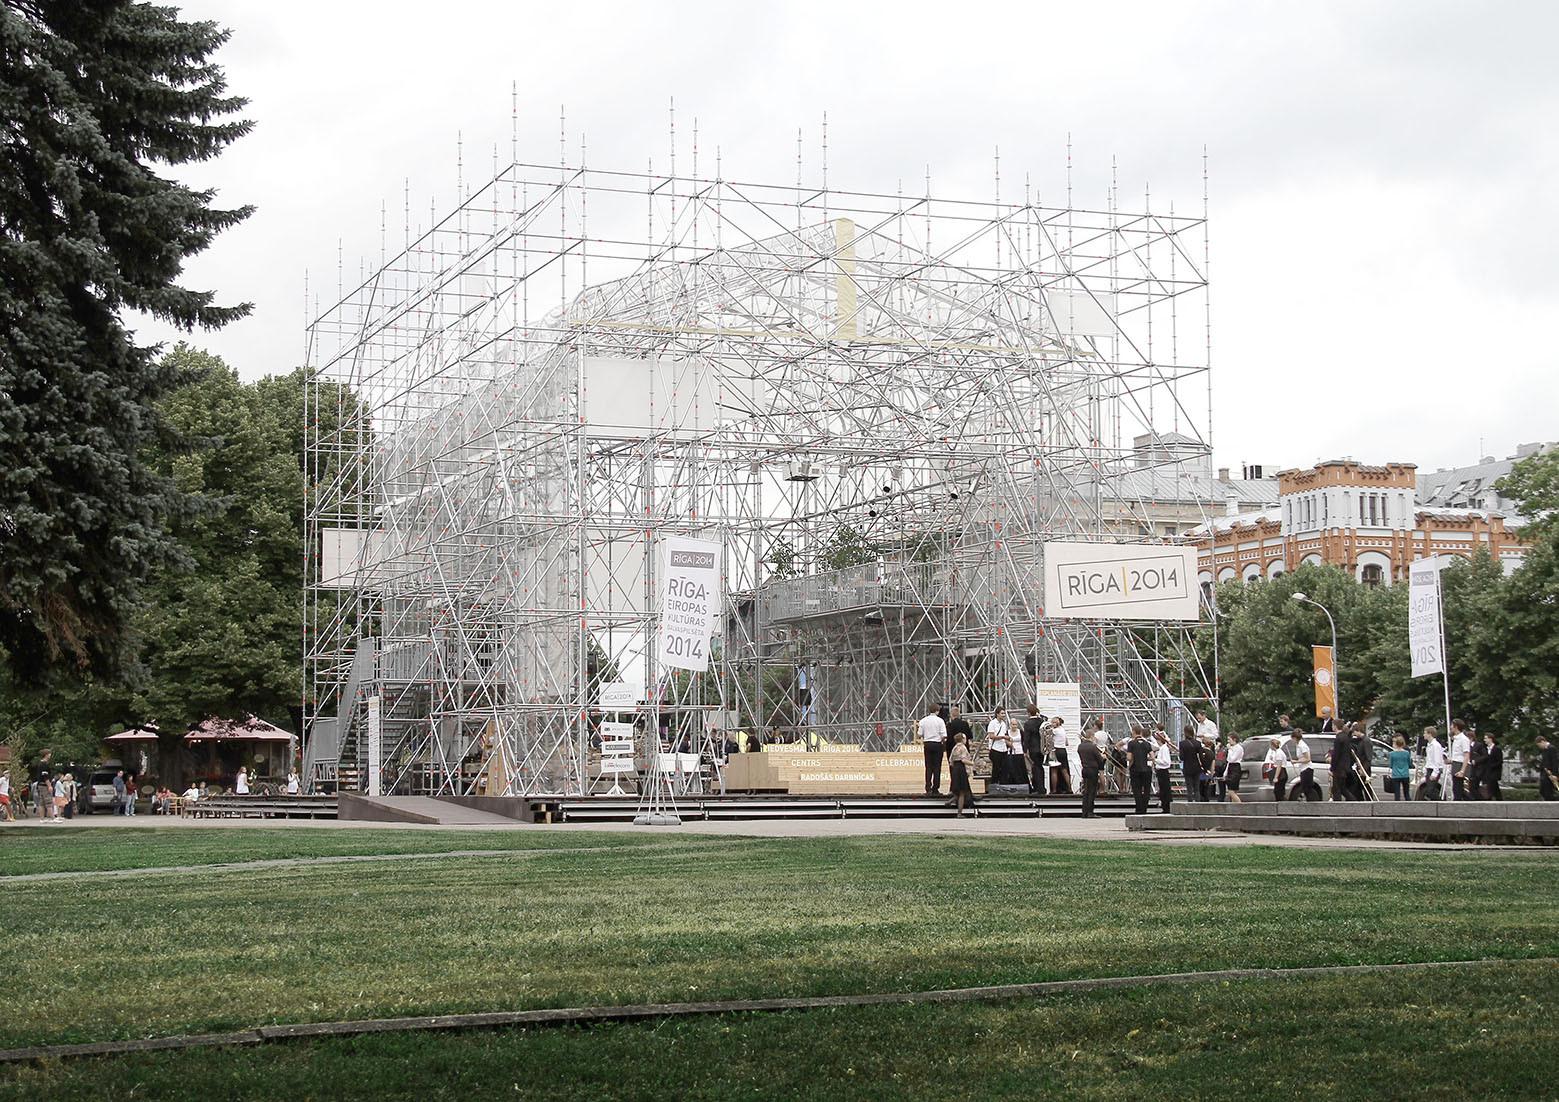 Riga 2014 Pavilion / Mailitis A.I.I.M. , Courtesy of Austris Mailitis